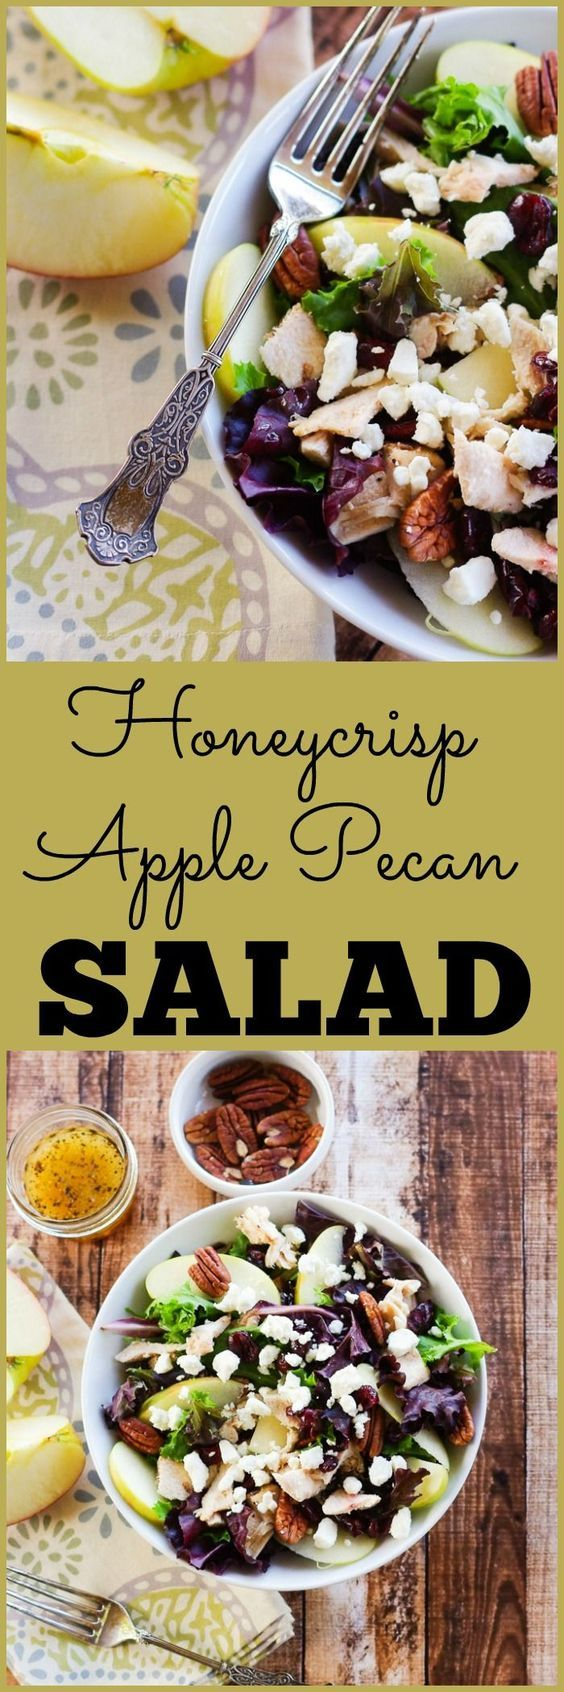 nice Honeycrisp Apple Pecan Salad with an Apple Cider Vinaigrette